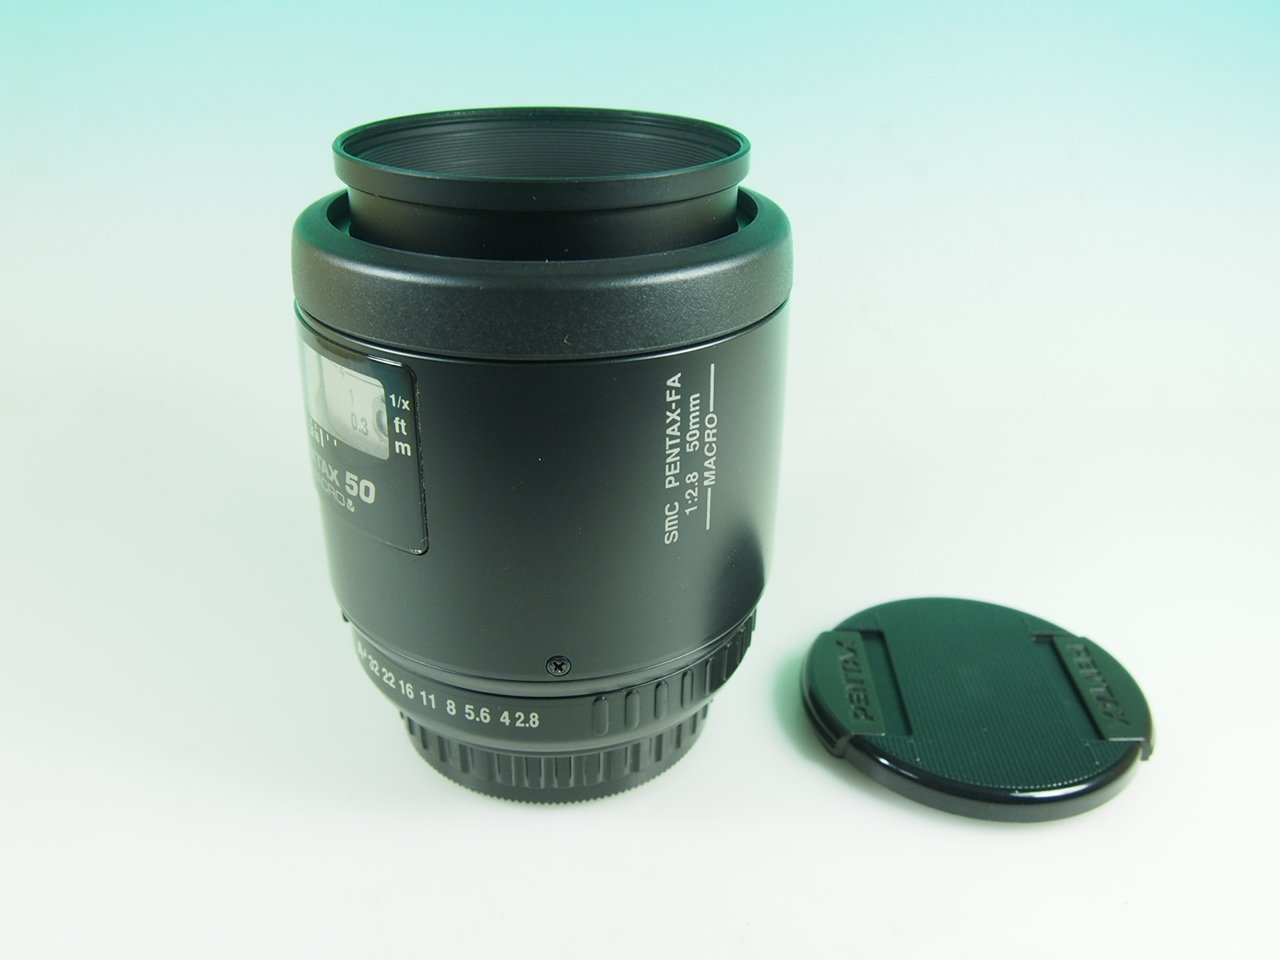 Pentax FA 50mm F2.8 macro   B008QG94MU